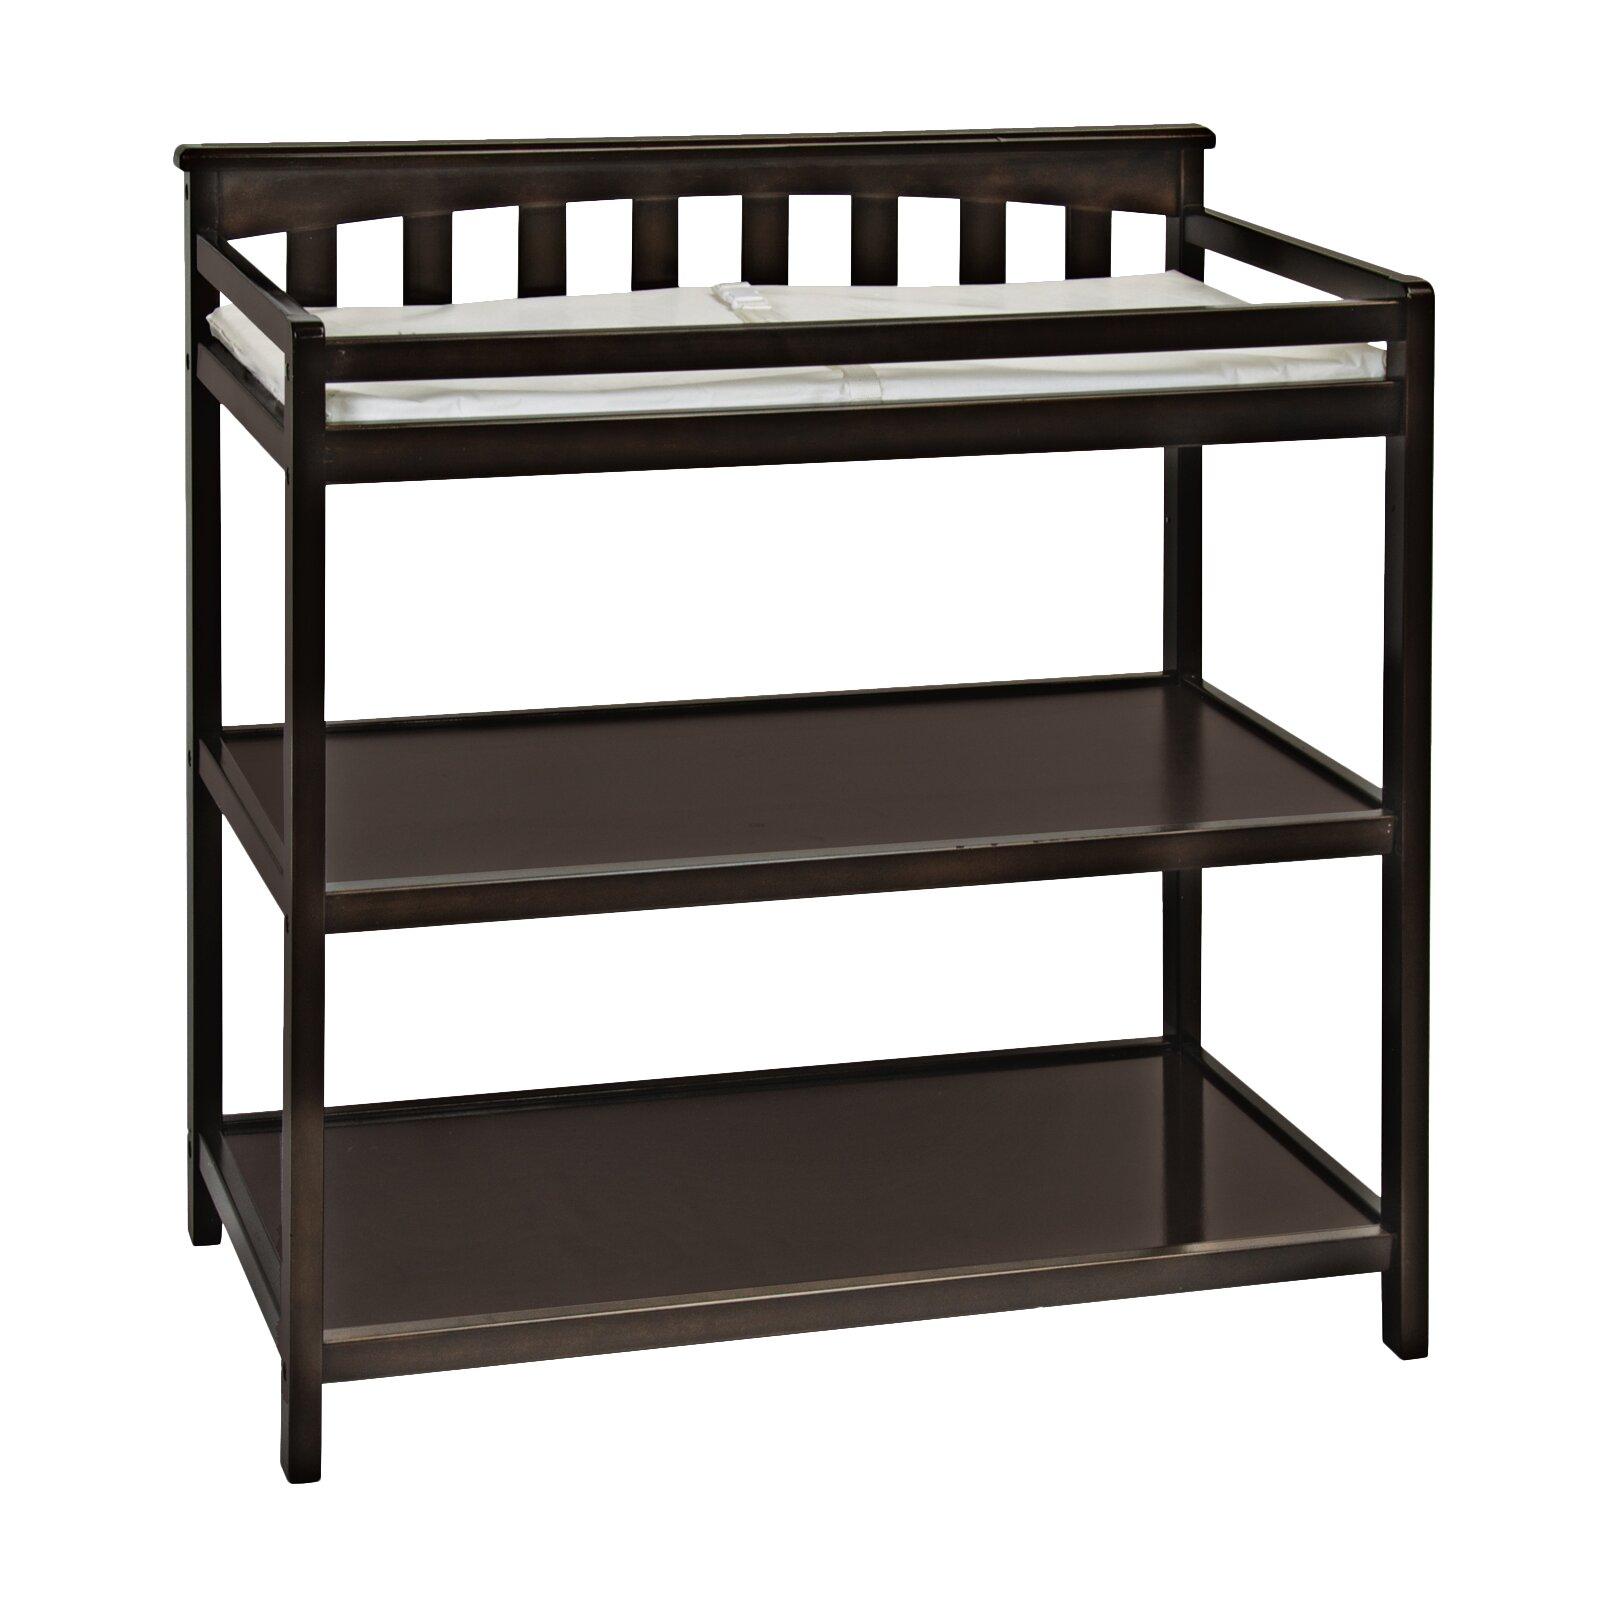 child craft london flat top changing table reviews wayfair. Black Bedroom Furniture Sets. Home Design Ideas